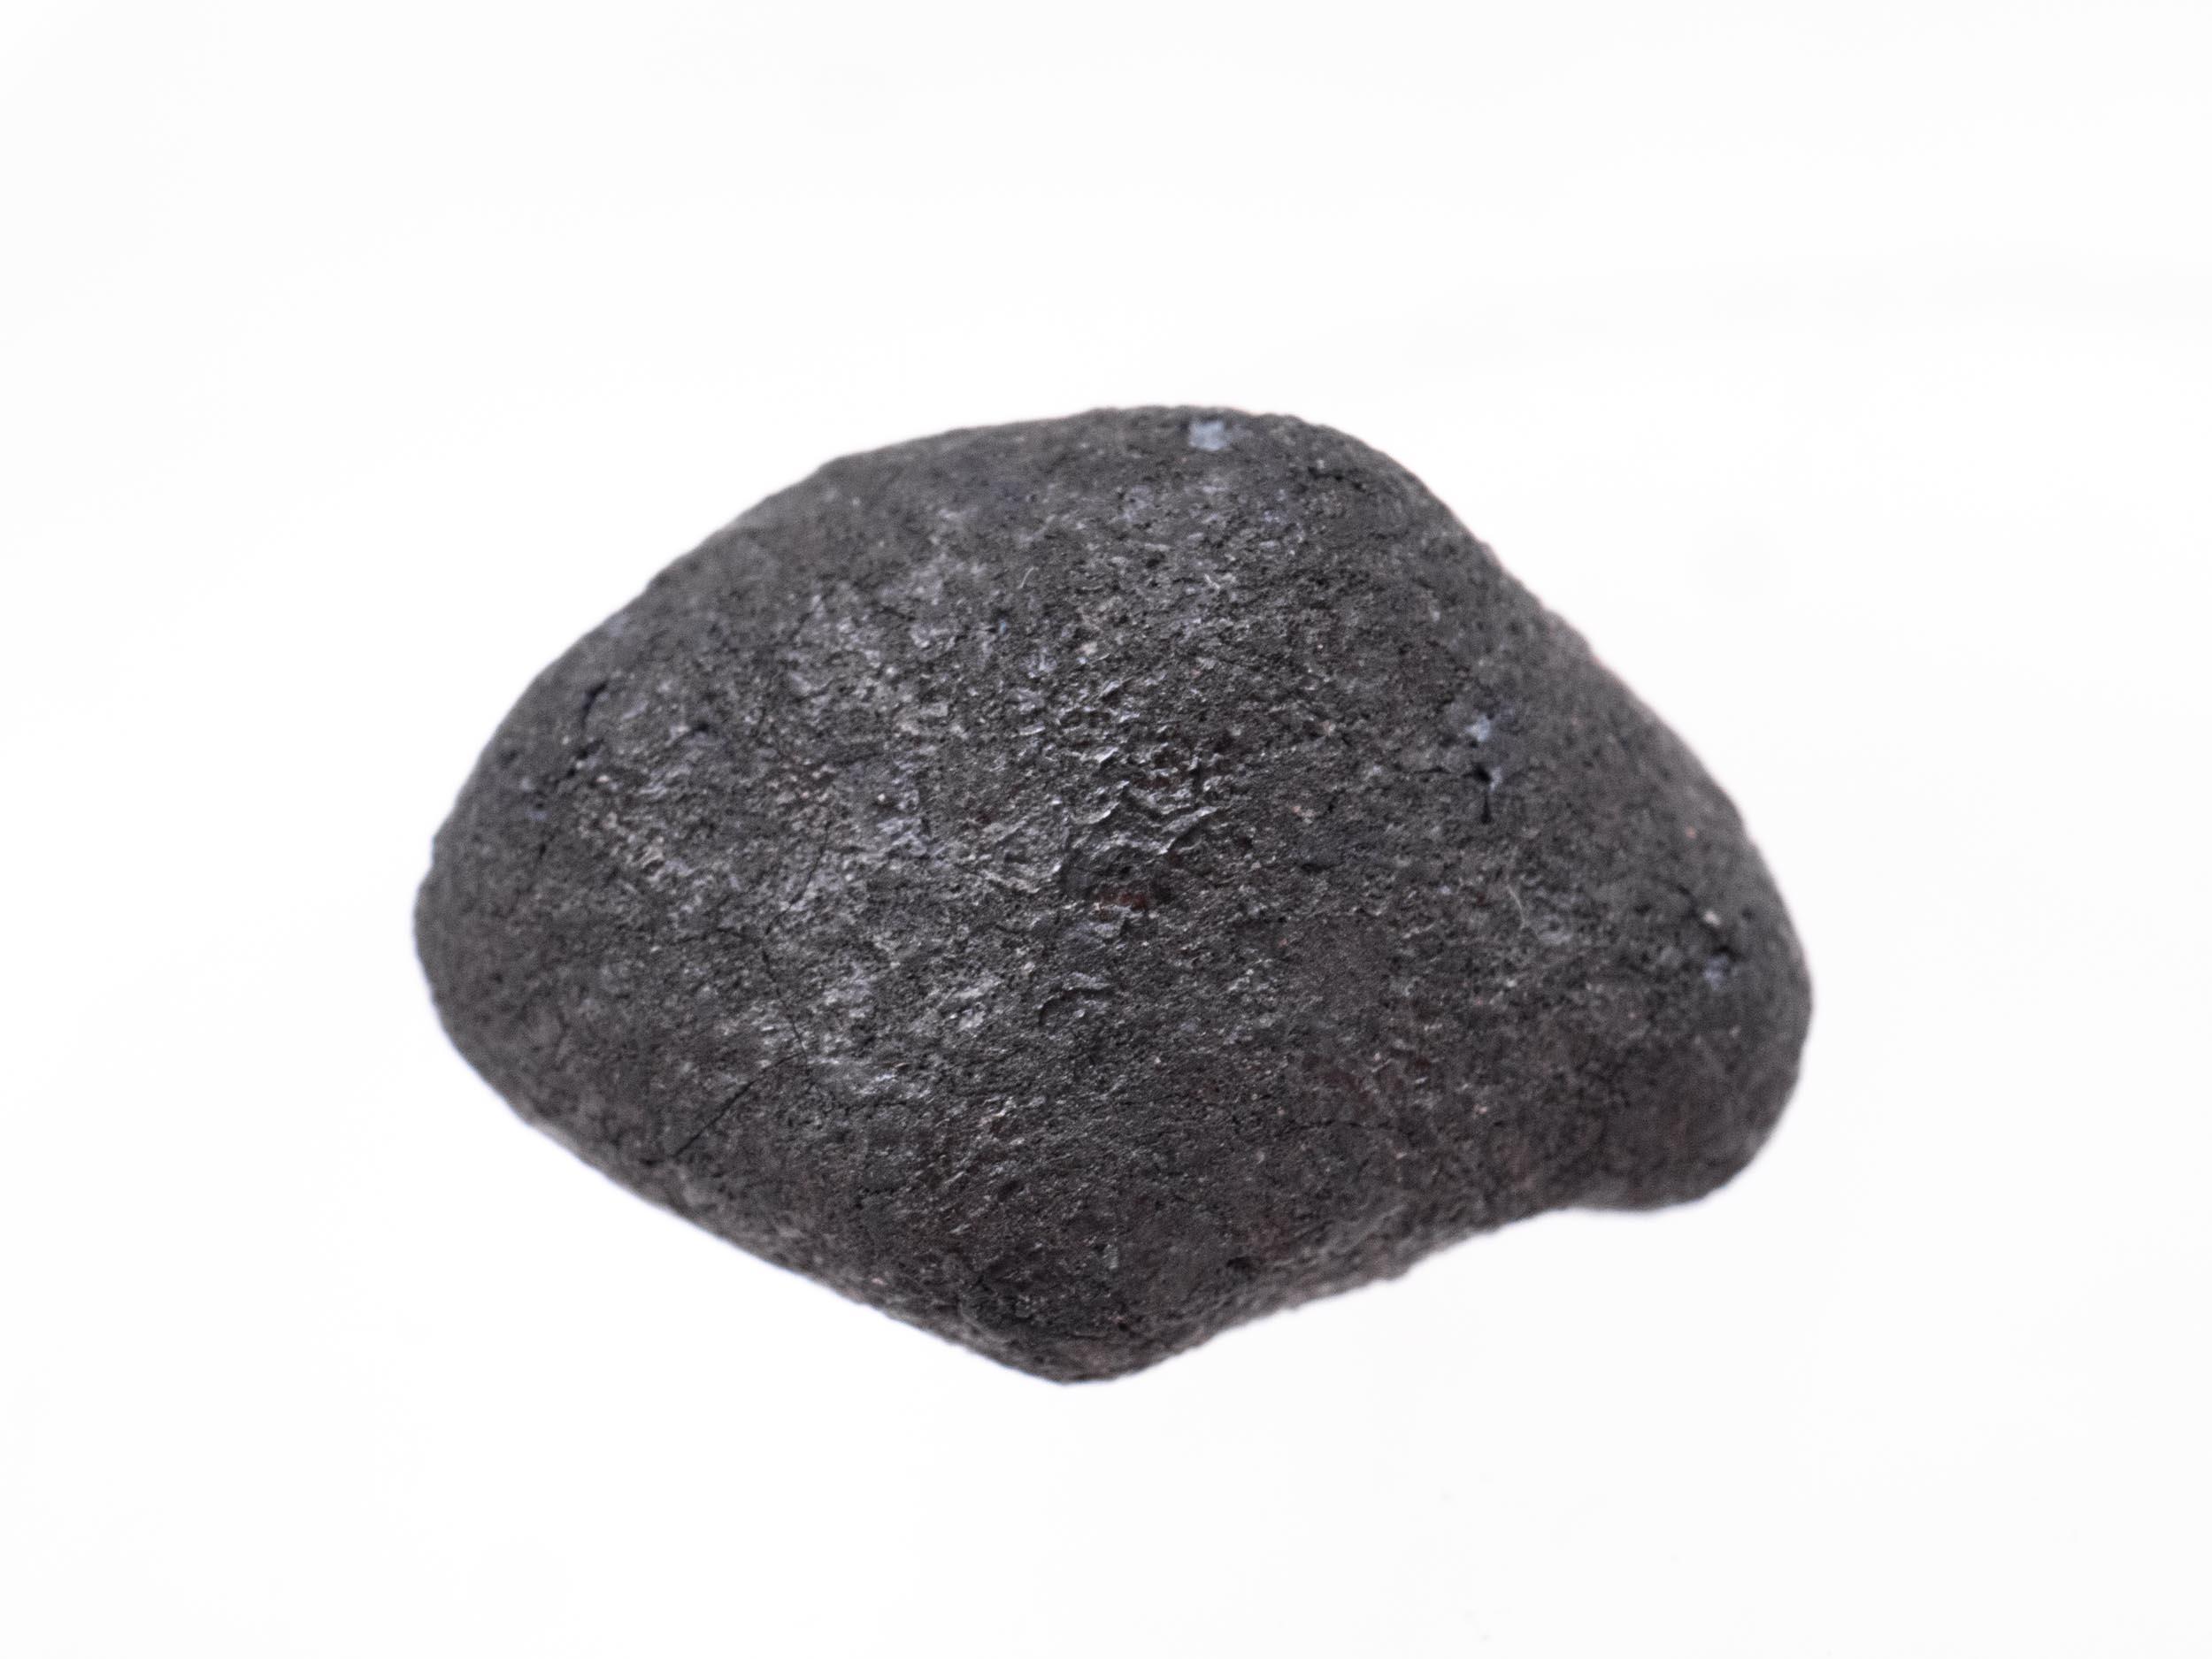 chelyabinsk 1 5 g